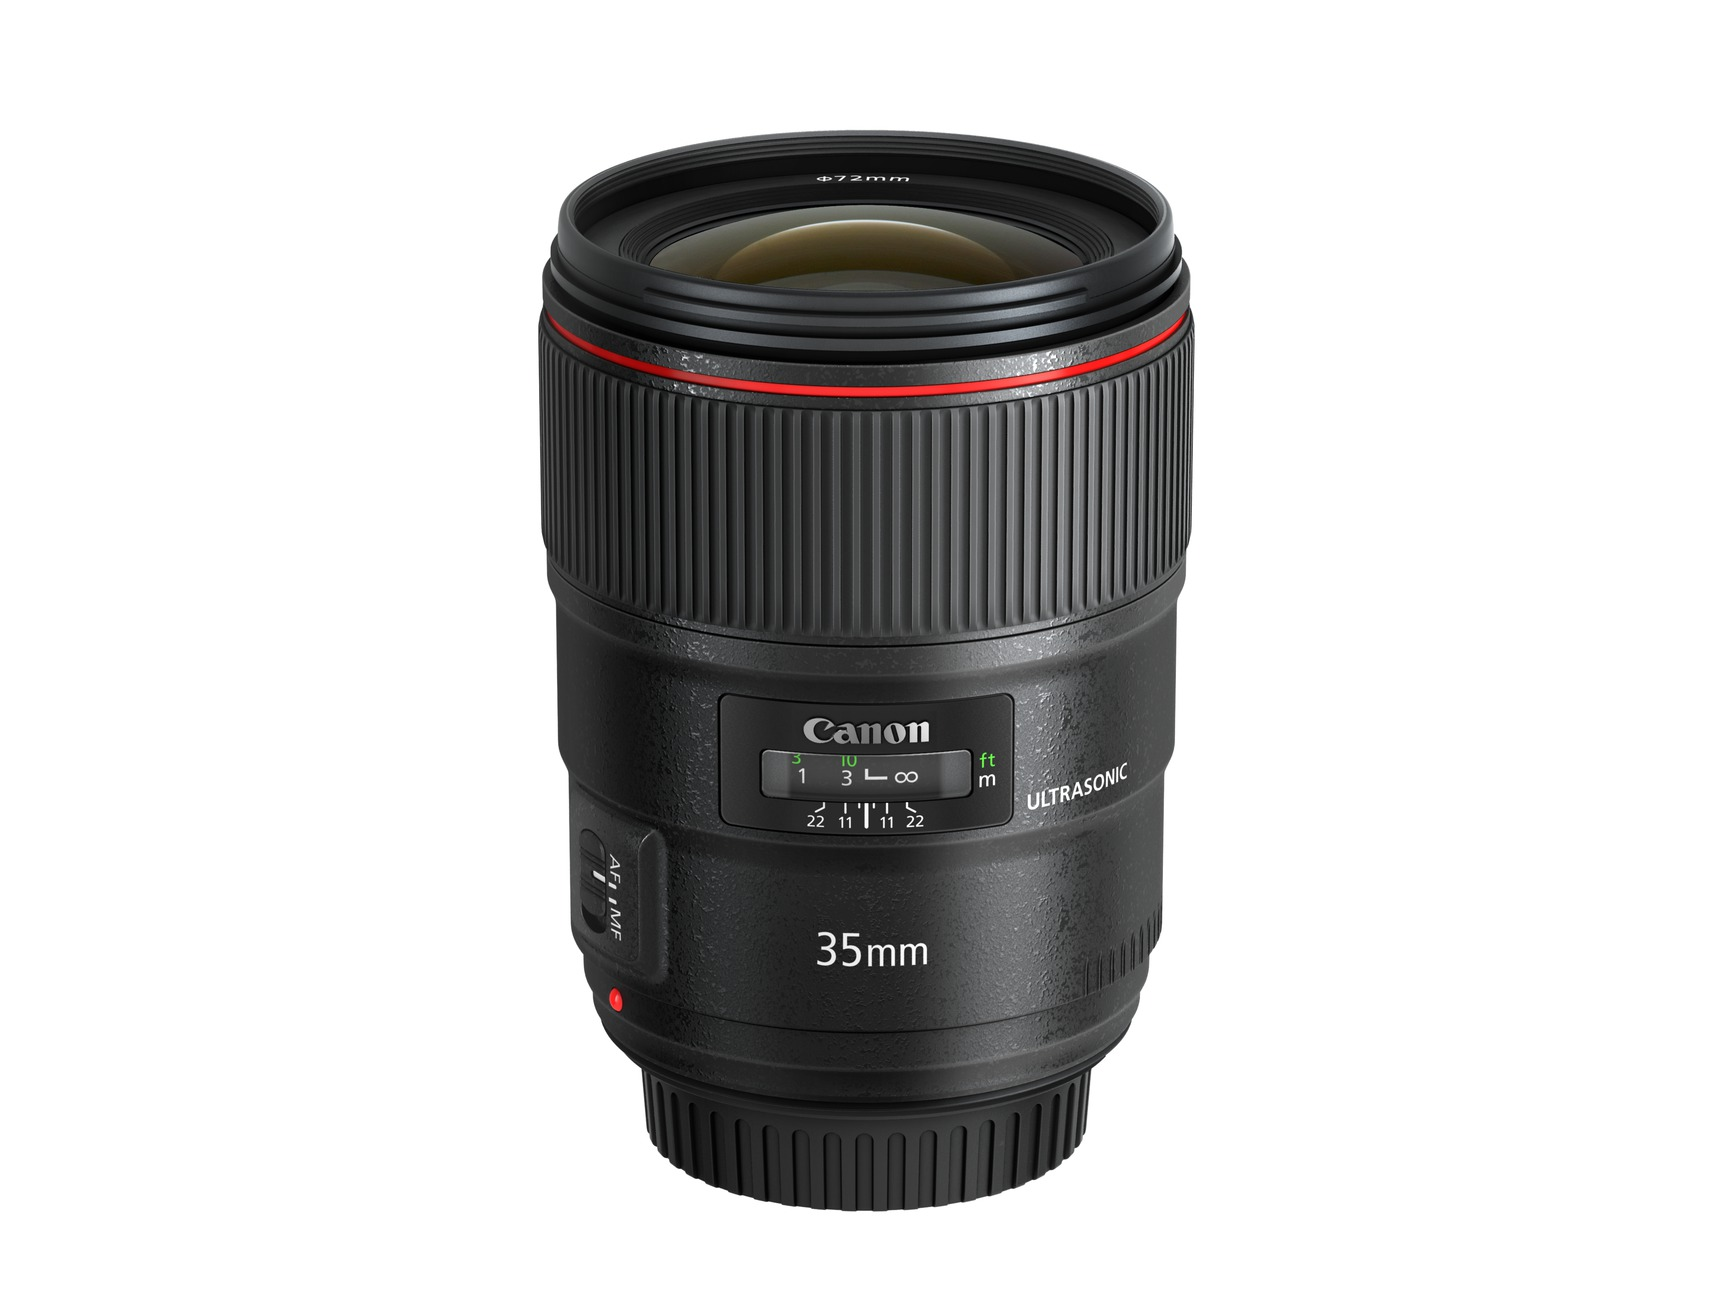 Moderni klassikko: uusi Canon EF 35 mm f/1,4L II USM